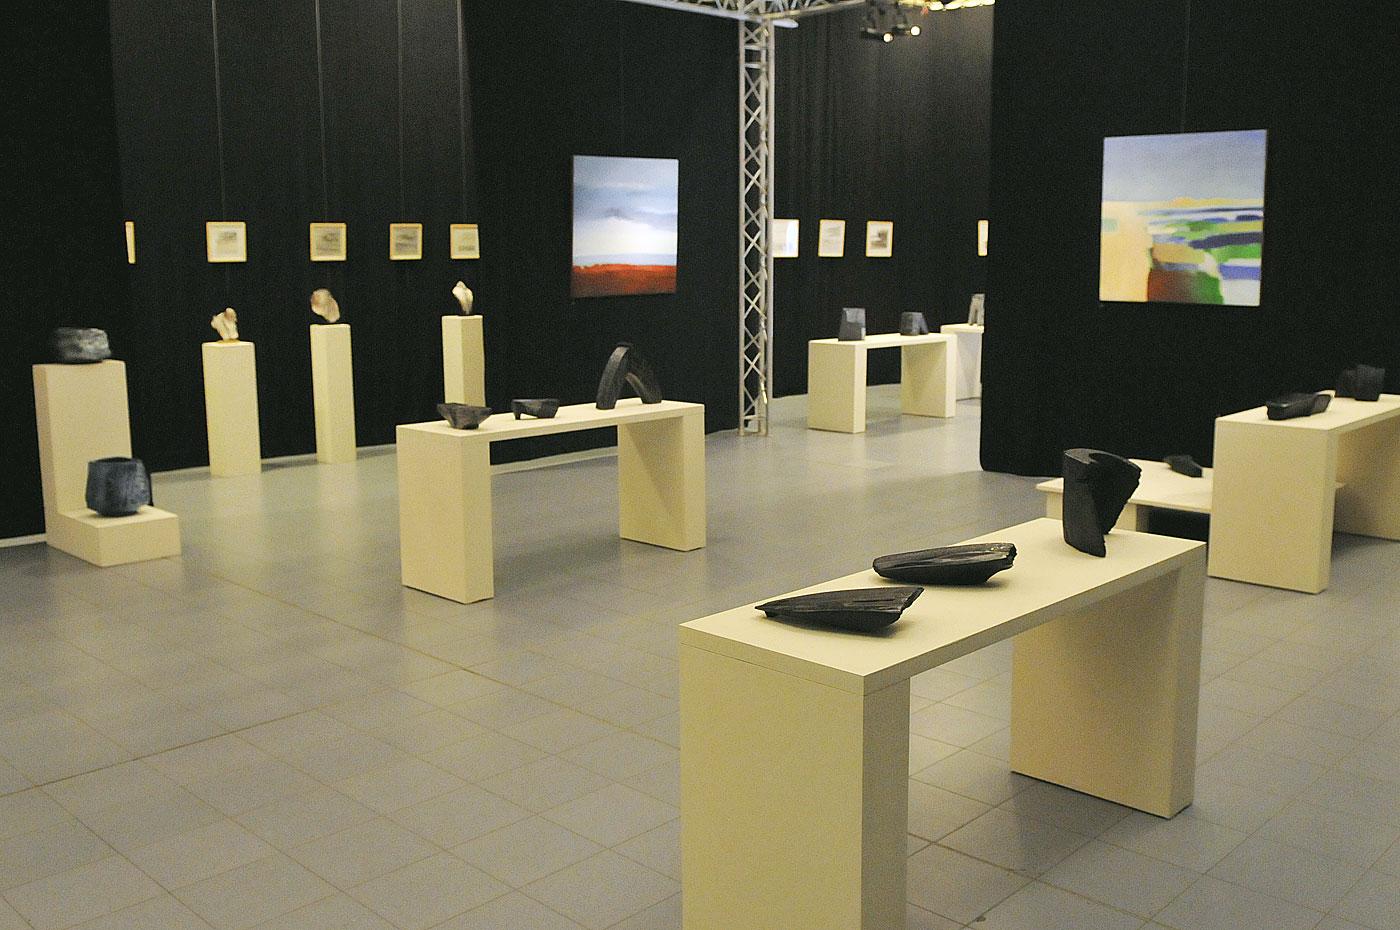 expo dautry